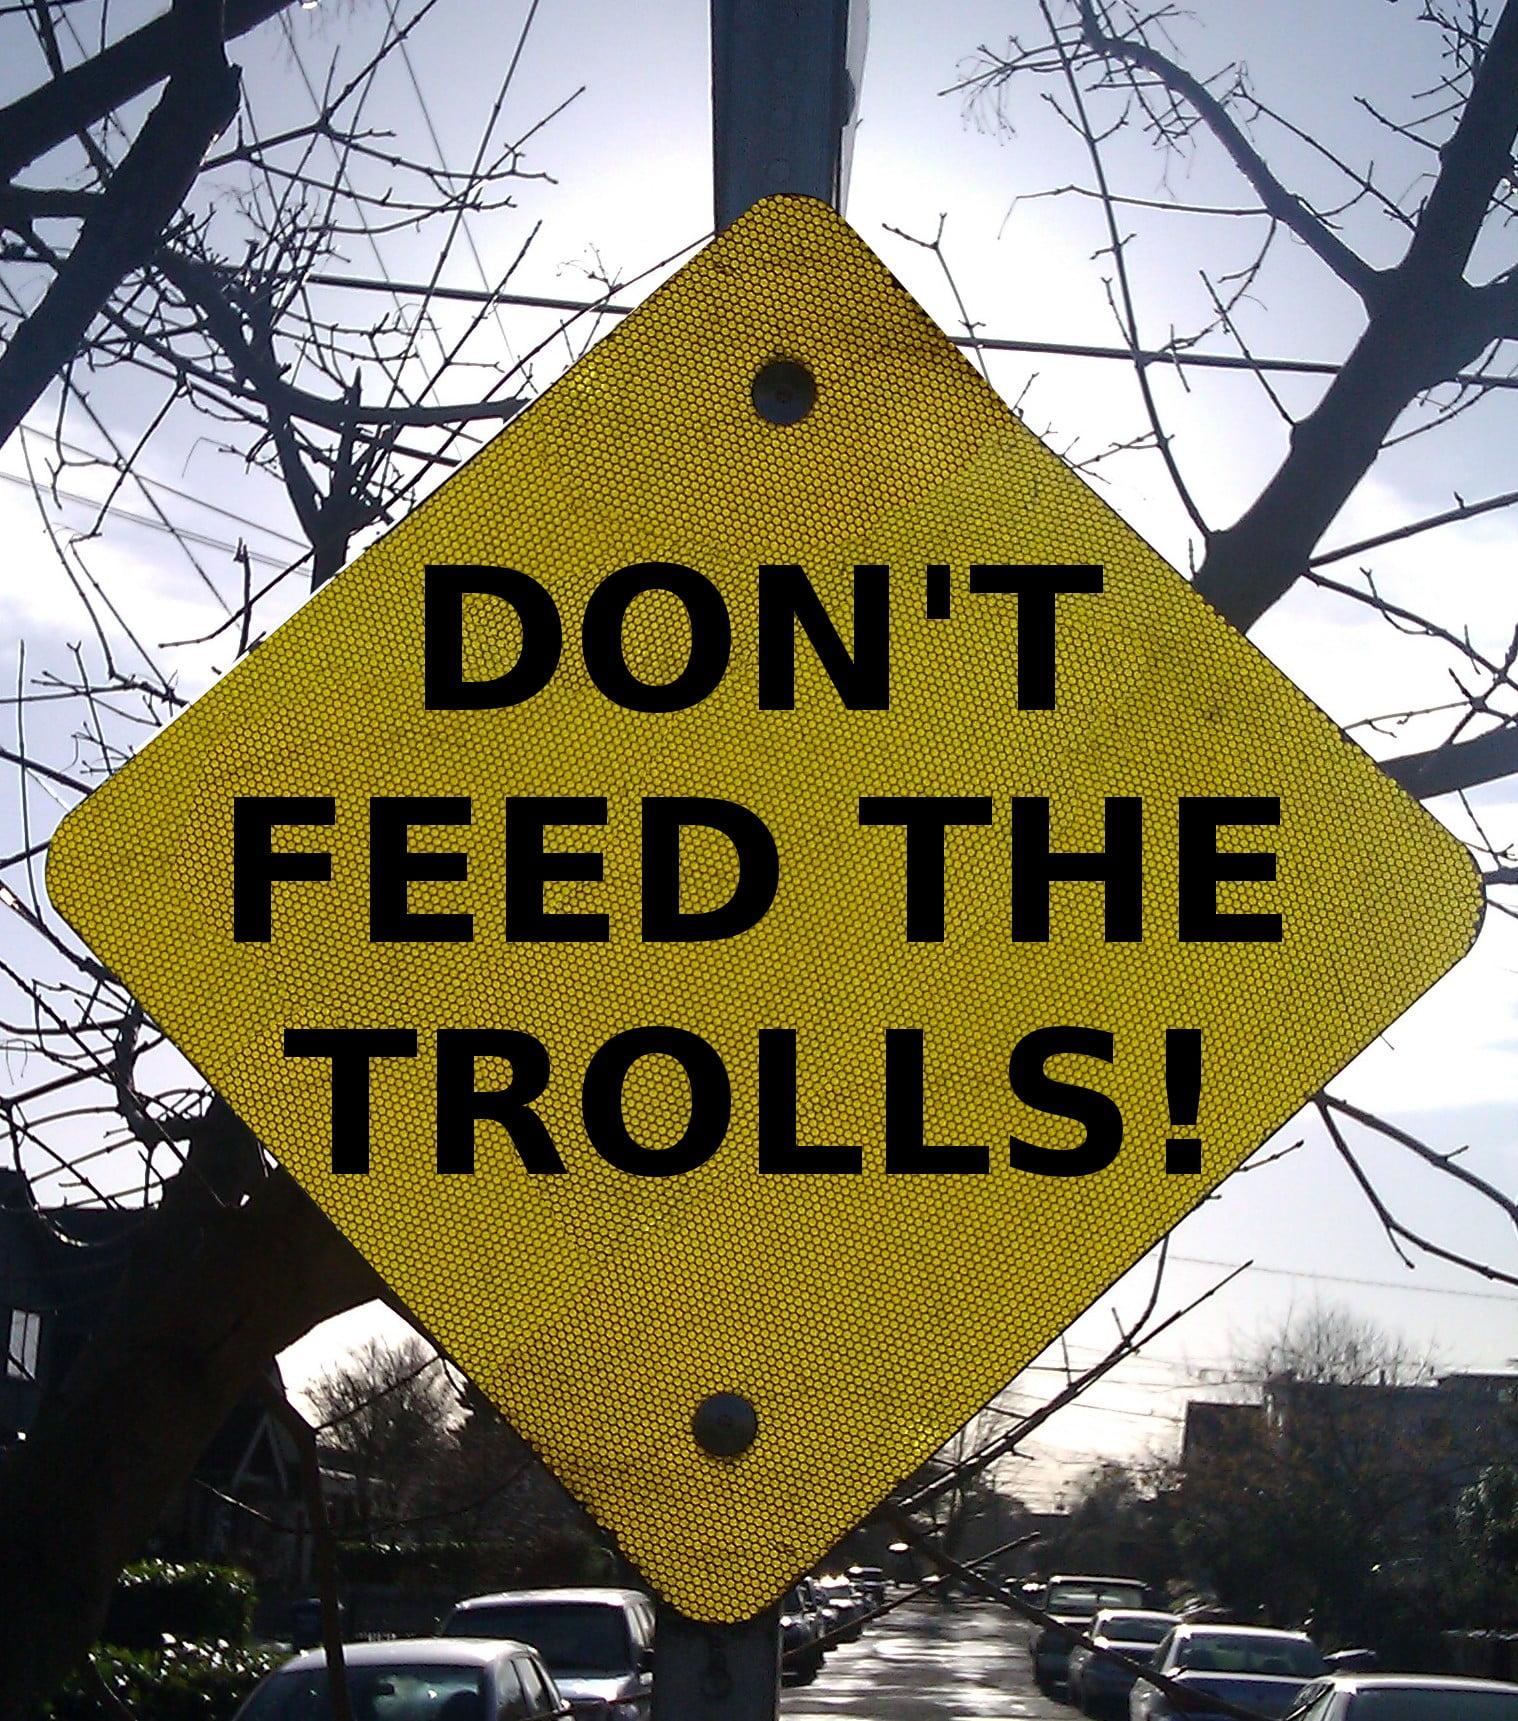 Censorship against Trolls would be censorship against us all